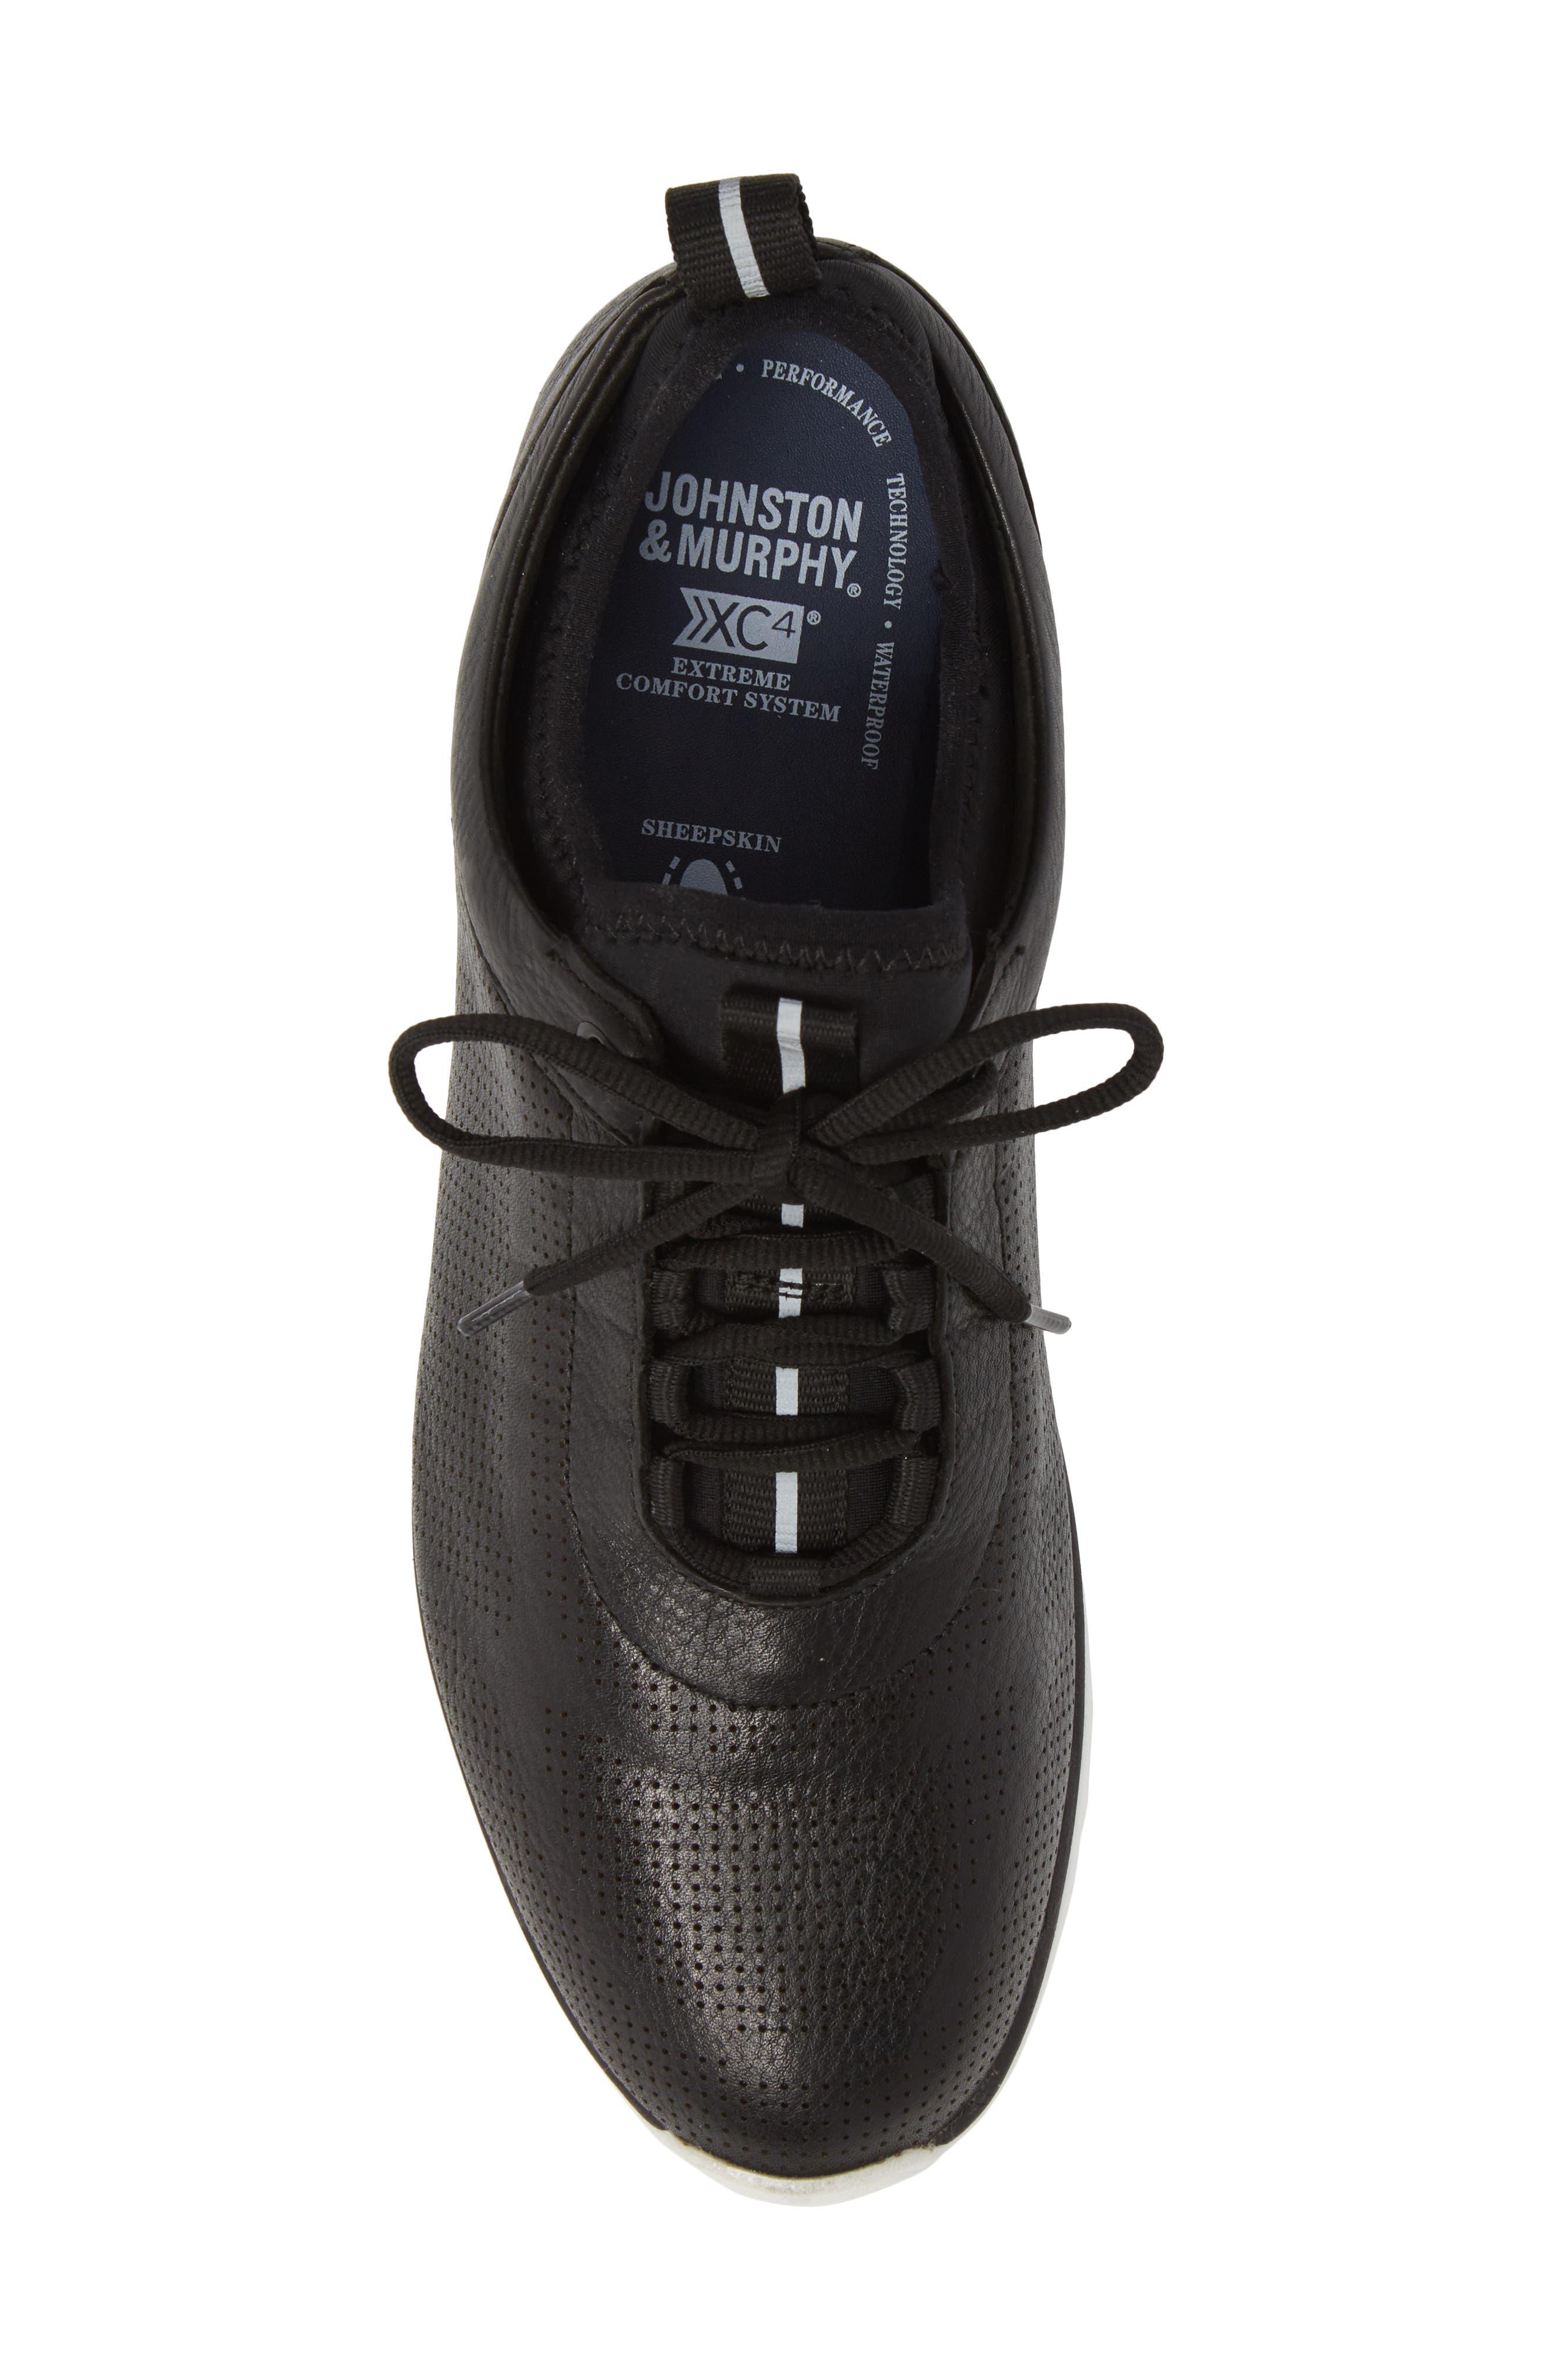 Prentiss XC4<sup>®</sup> Waterproof Sneaker,                             Alternate thumbnail 5, color,                             BLACK LEATHER